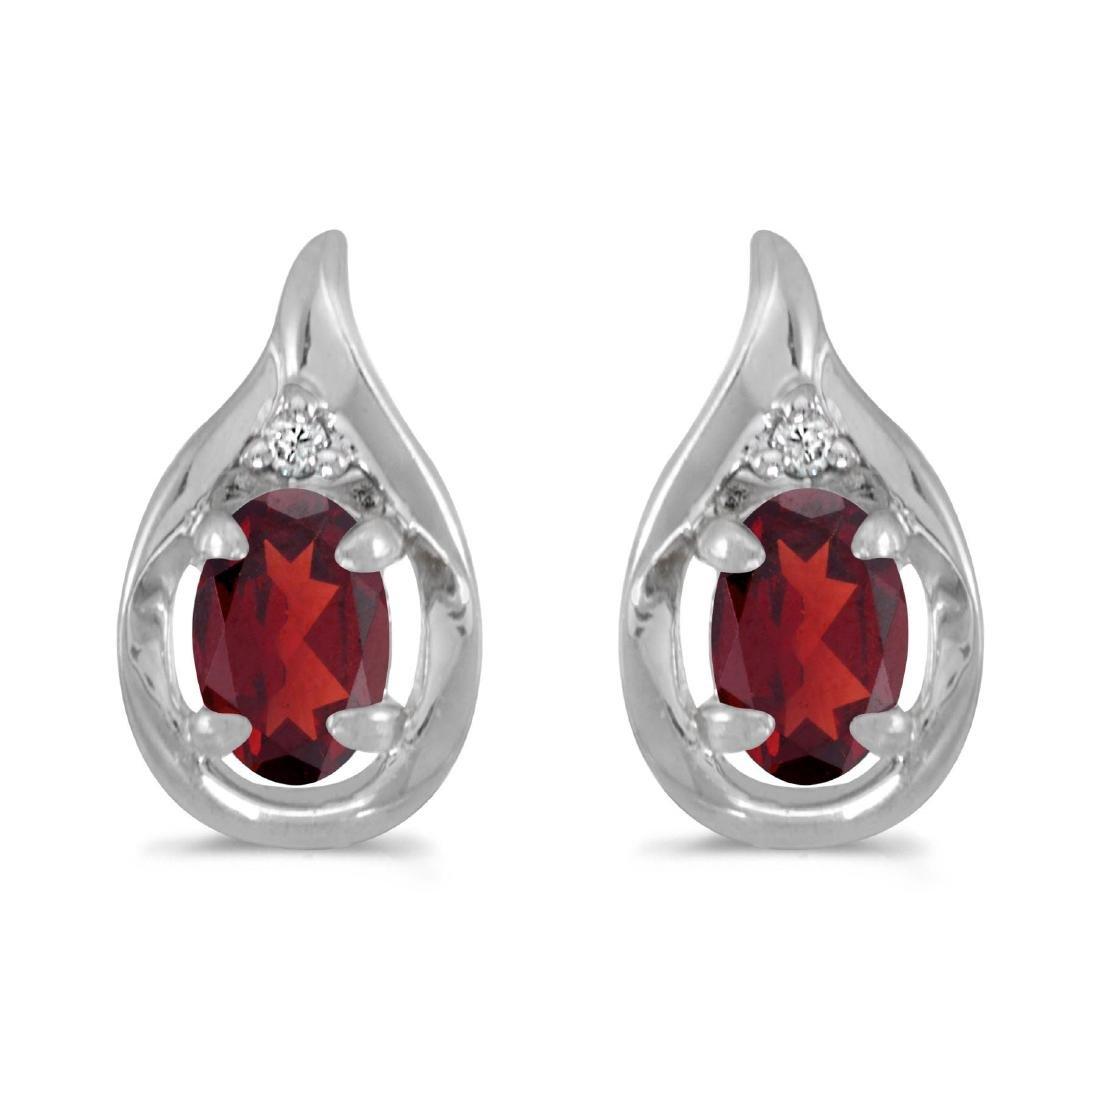 Certified 14k White Gold Oval Garnet And Diamond Earrin